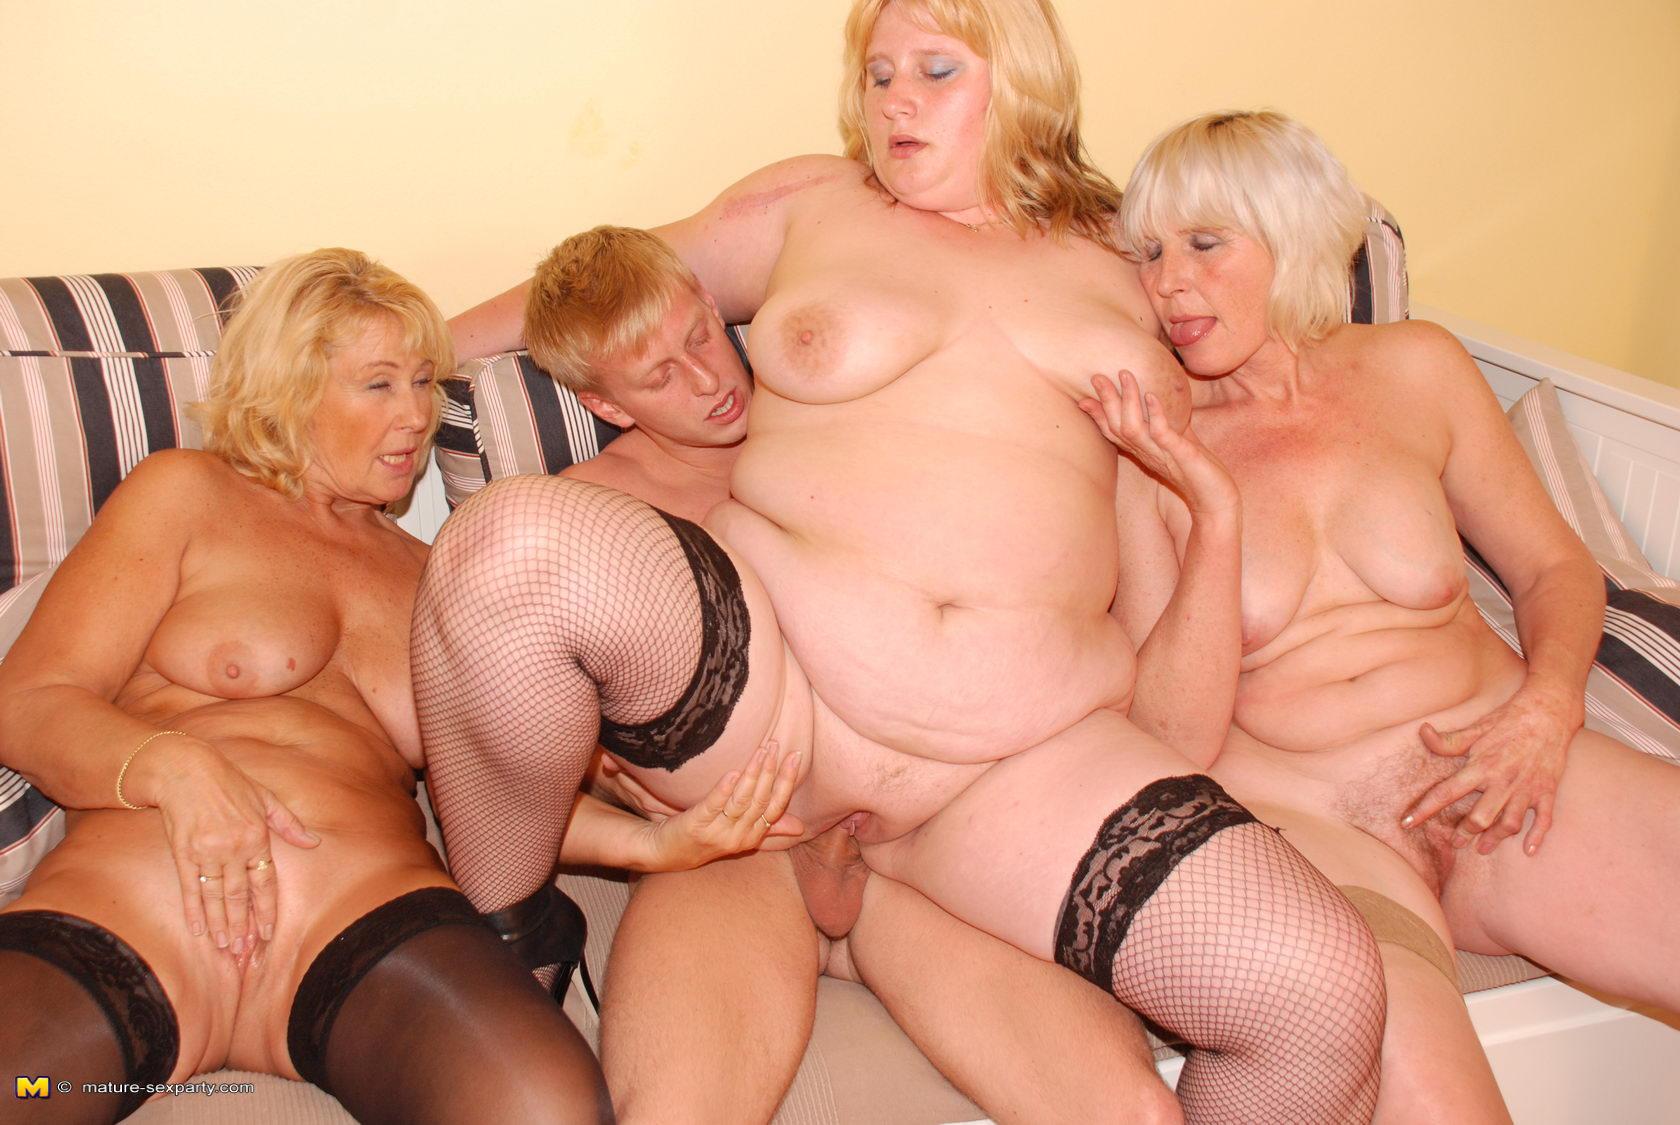 Порно бабушки бесплатно секс 21 фотография